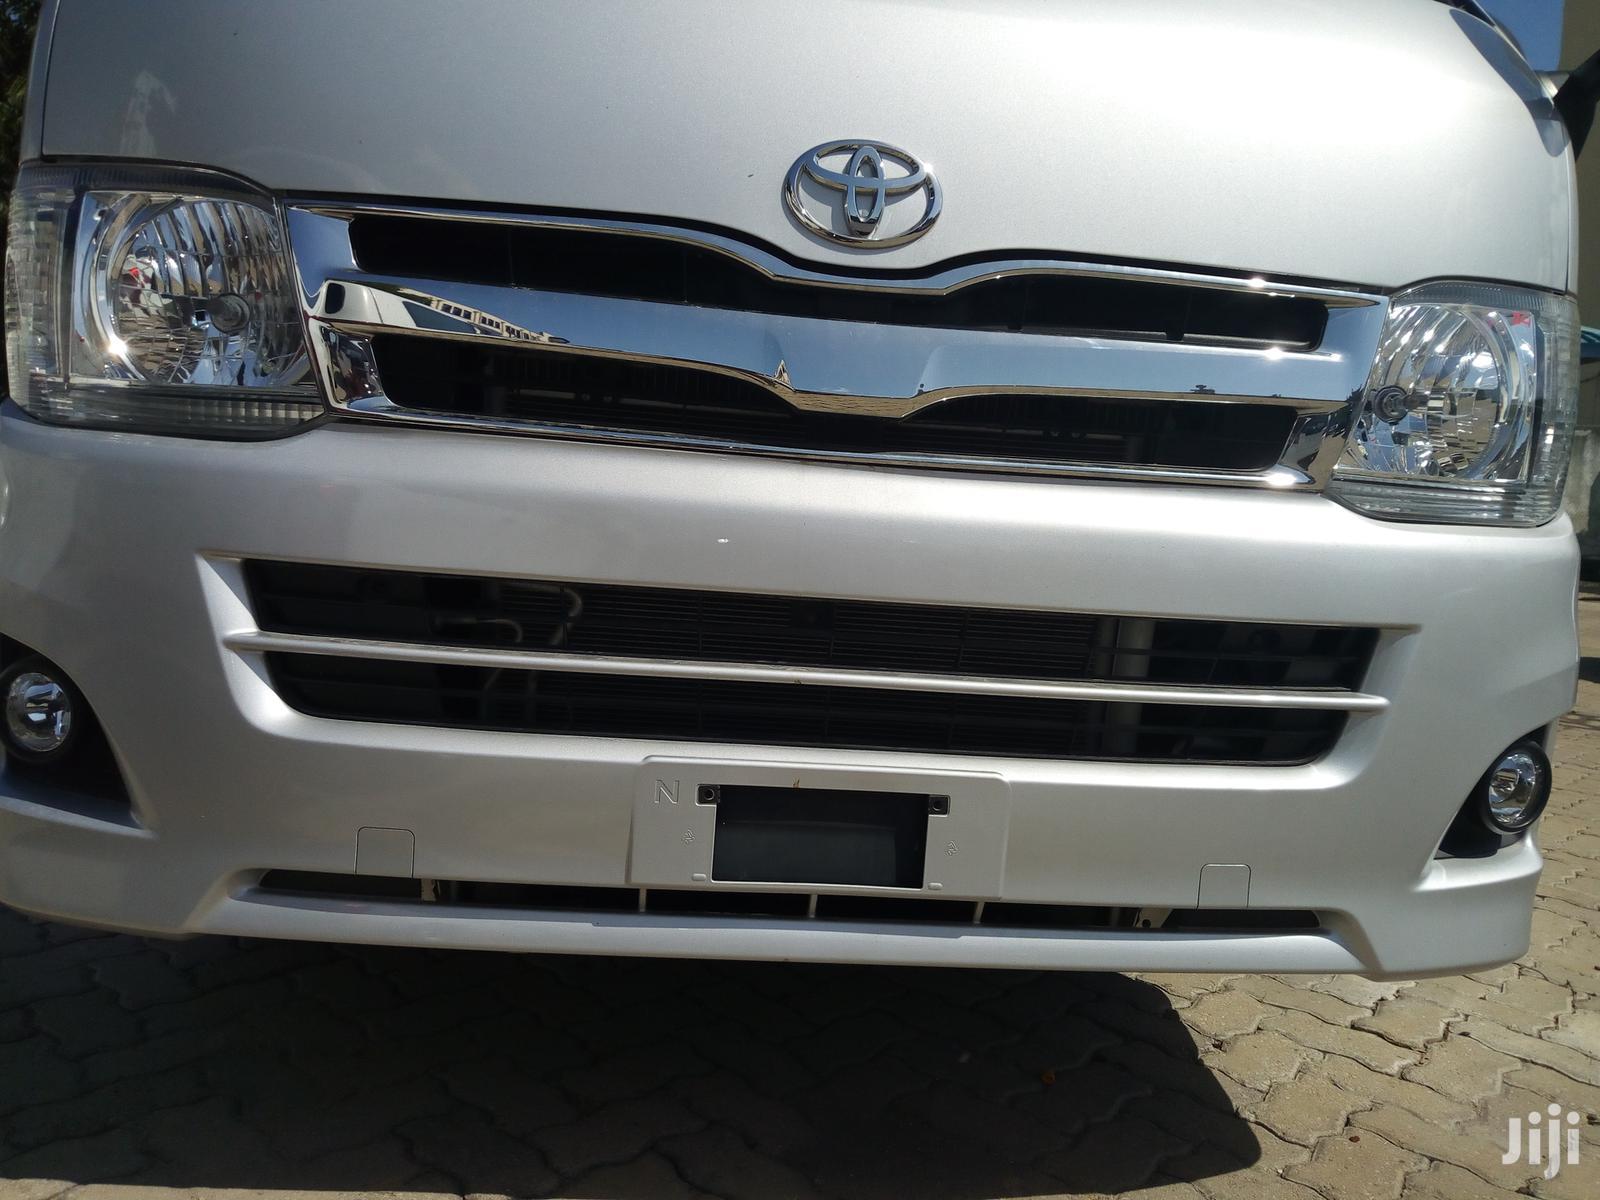 Toyota Hiace 2012 Silver | Buses & Microbuses for sale in Mvita, Mombasa, Kenya